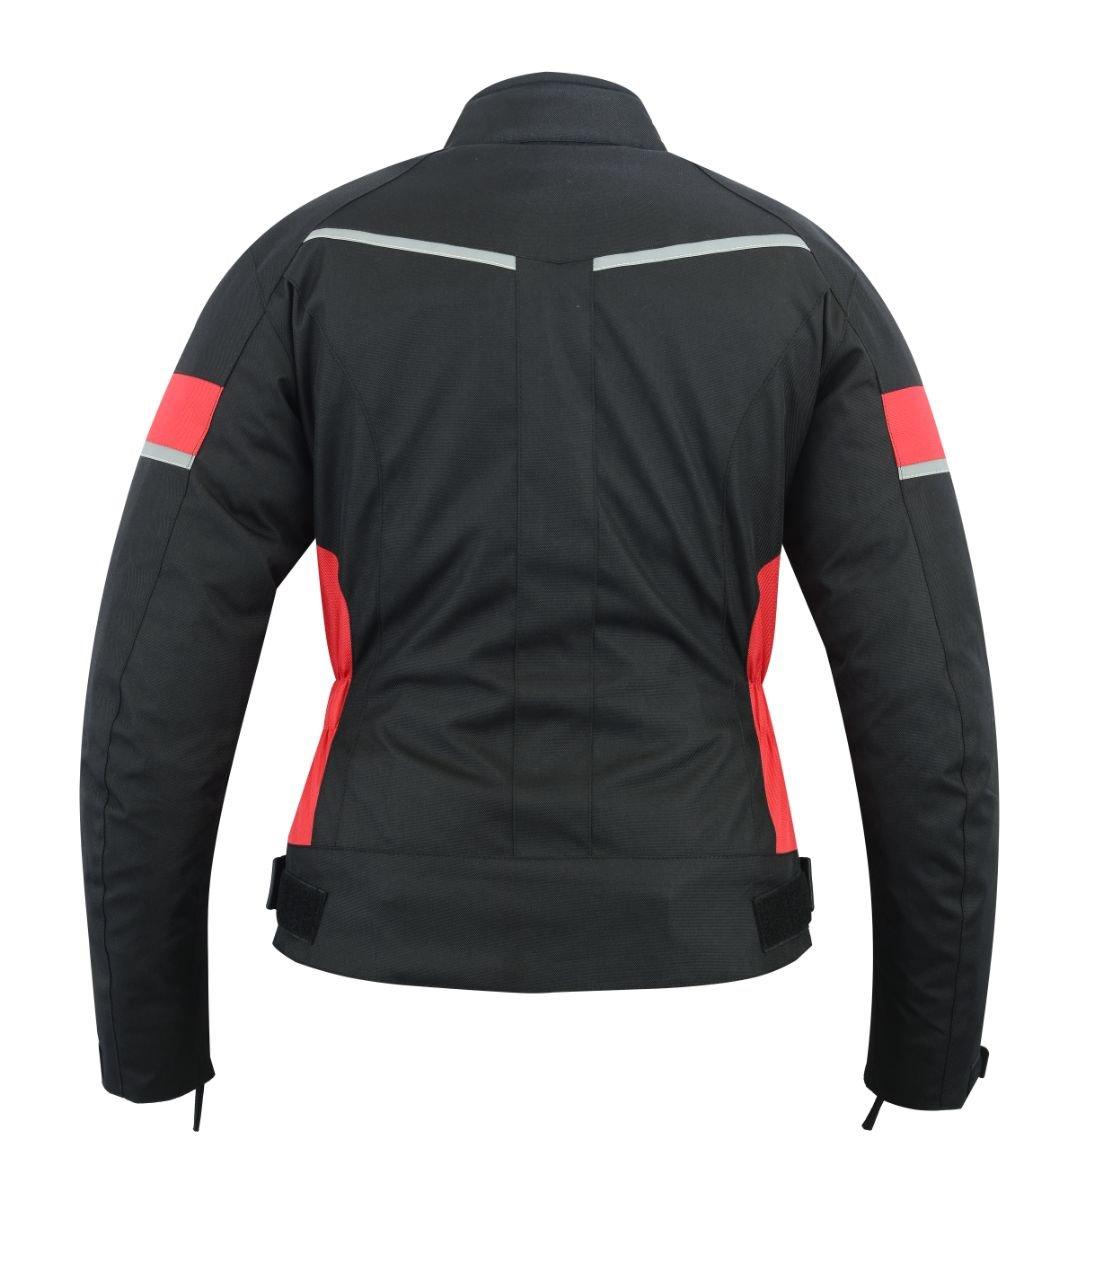 impermeabile nera//rossa Giacca da moto protettiva da donna WCJ-1834RED